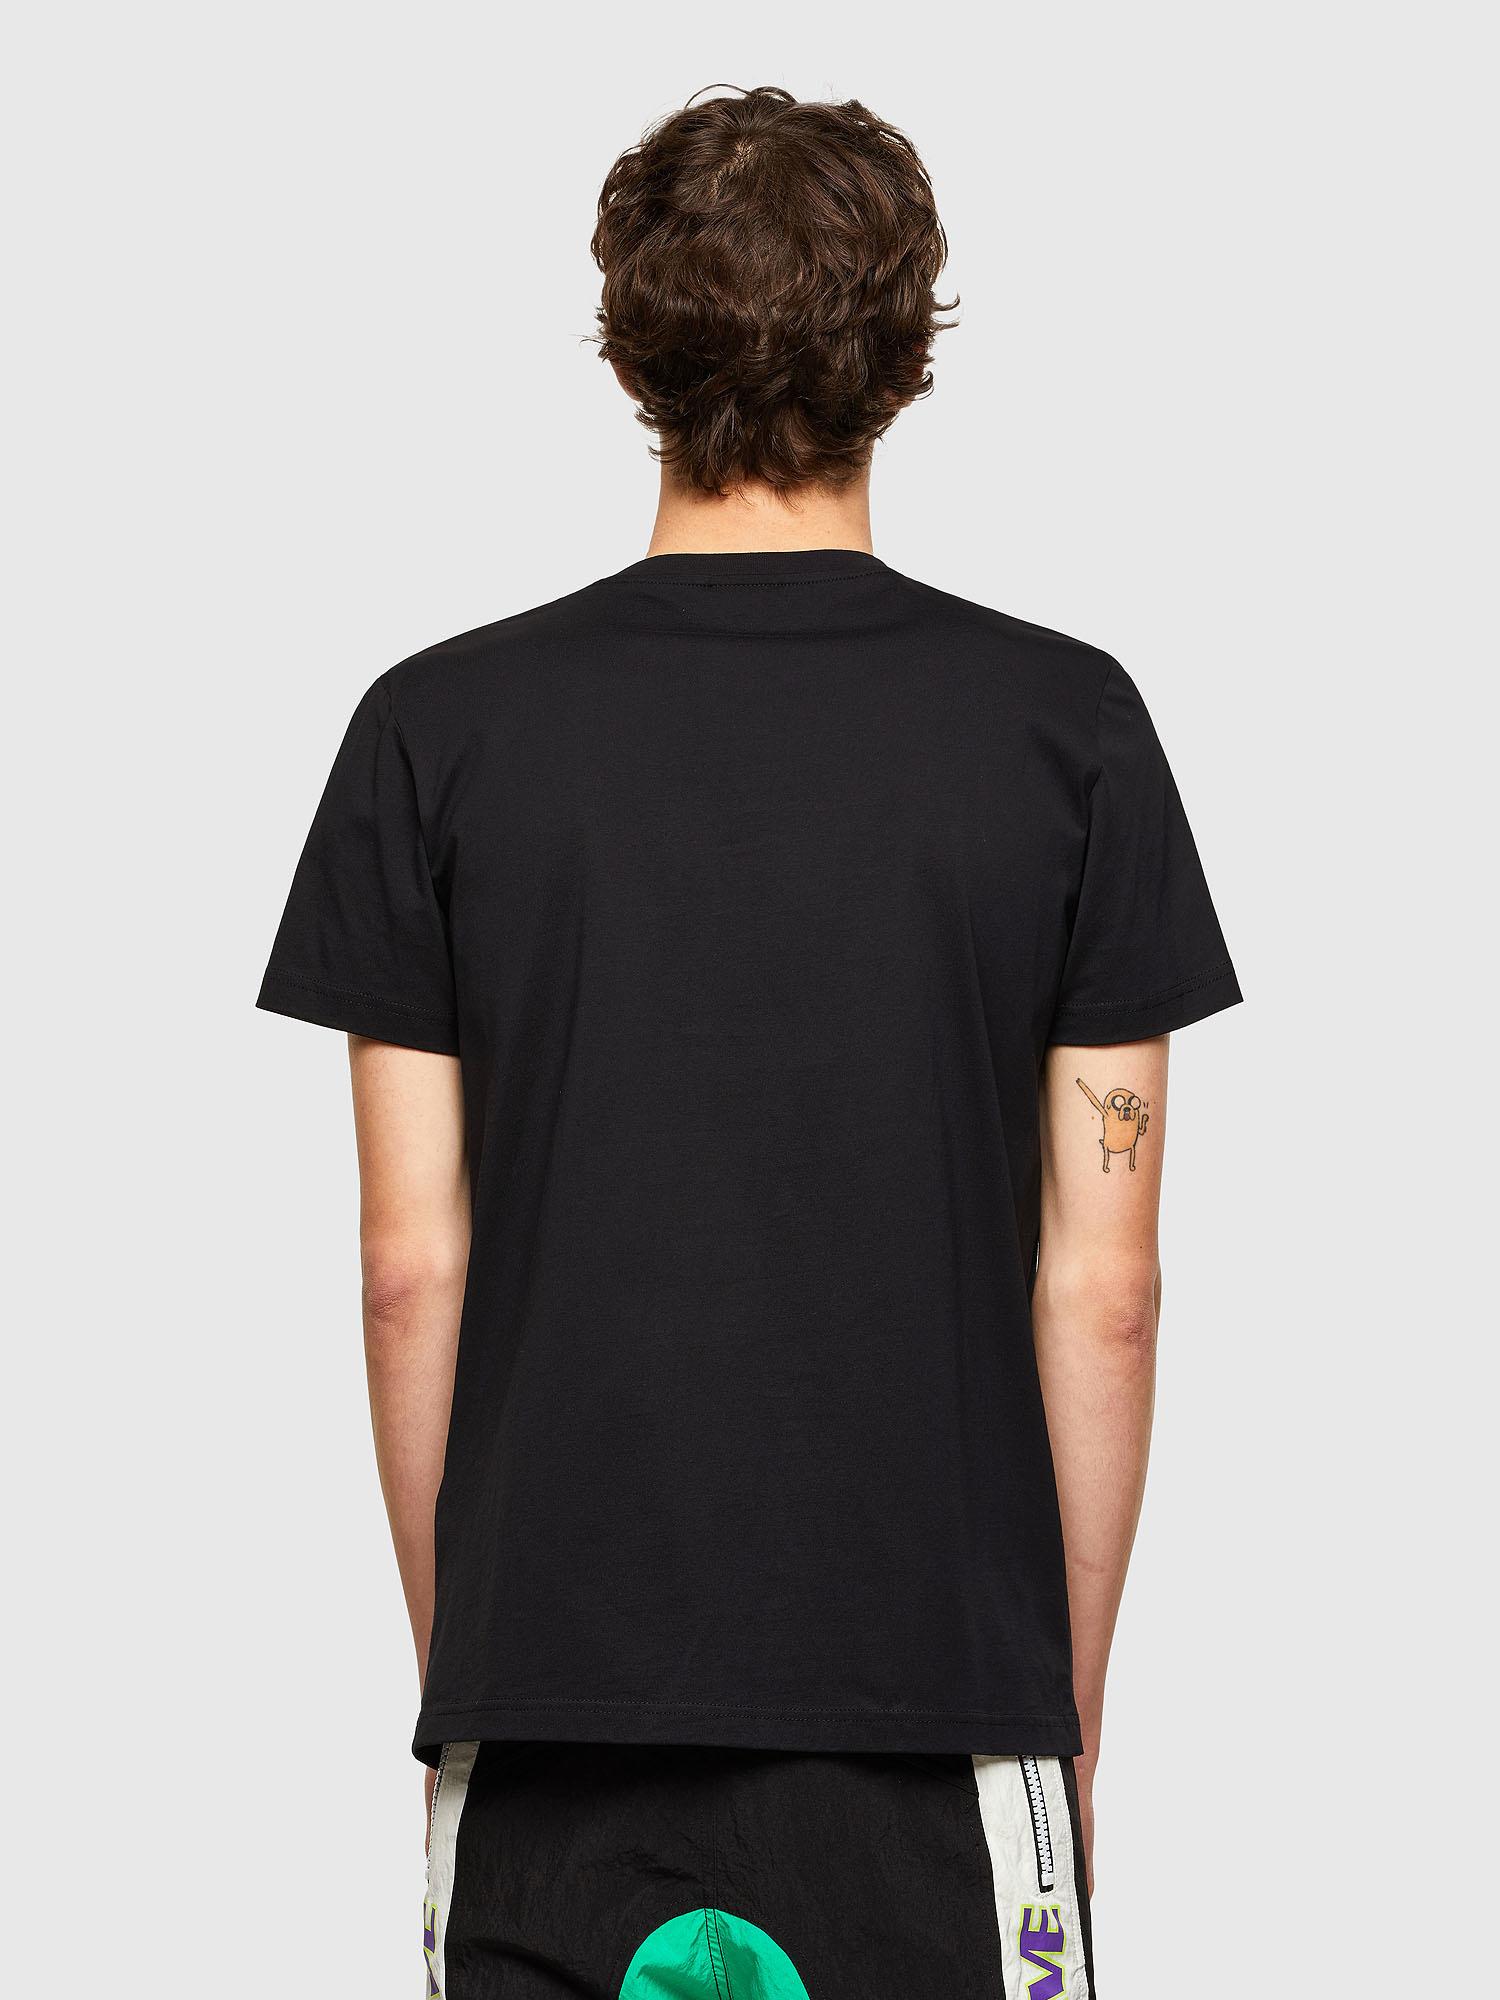 Diesel T-shirt Diesel A02378-0HAYU-9XX